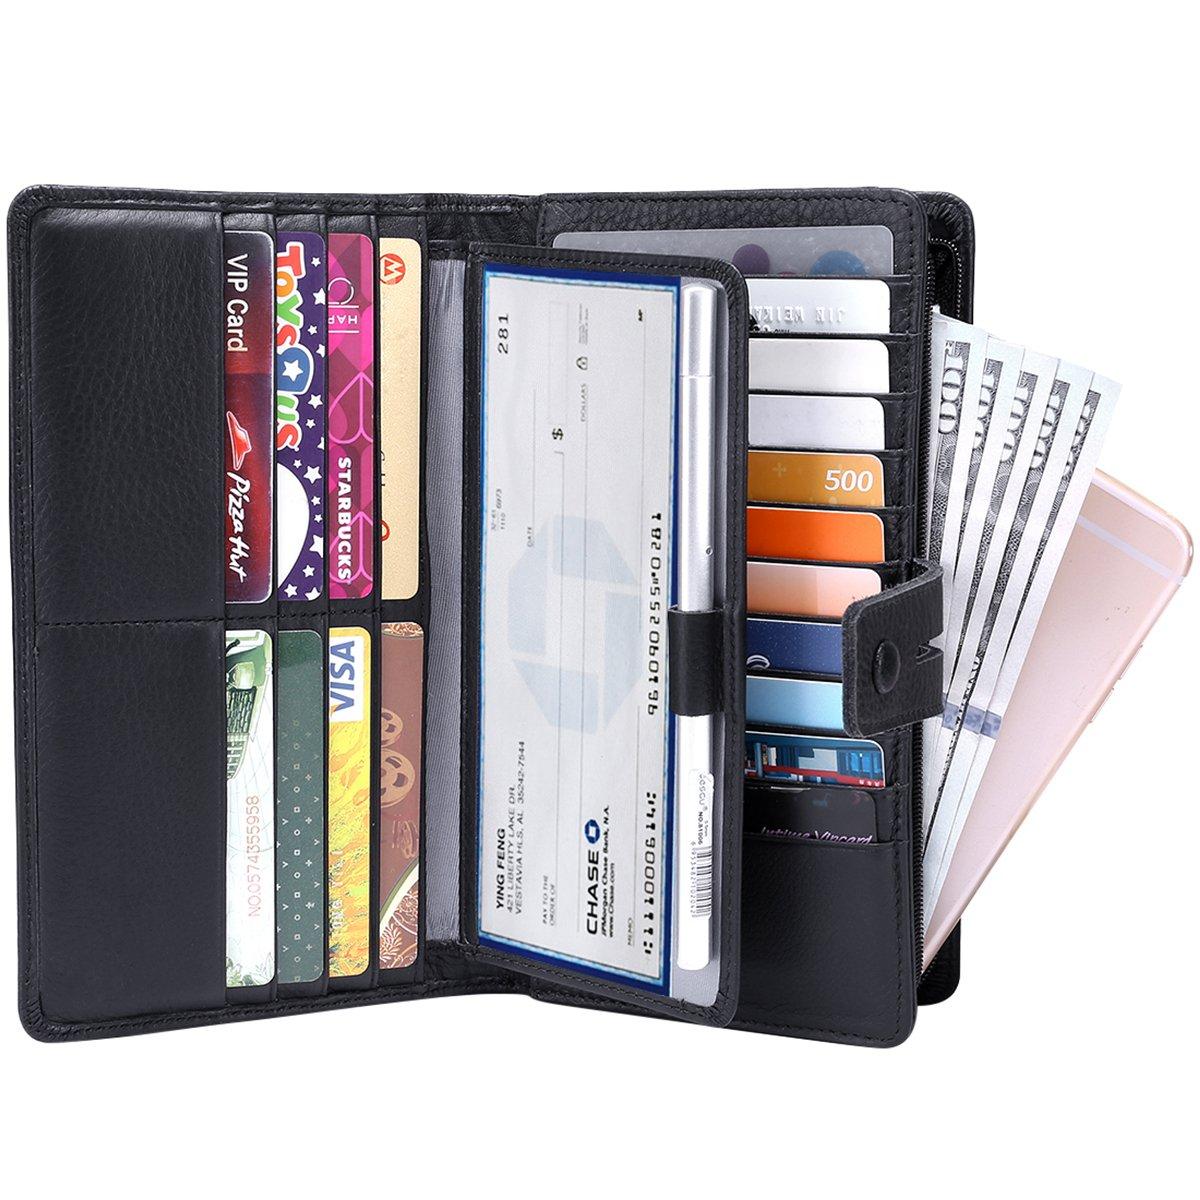 ITSLIFE Women's Big Fat RFID Blocking Leather Wallet Clutch Organizer Checkbook Holder (Black)